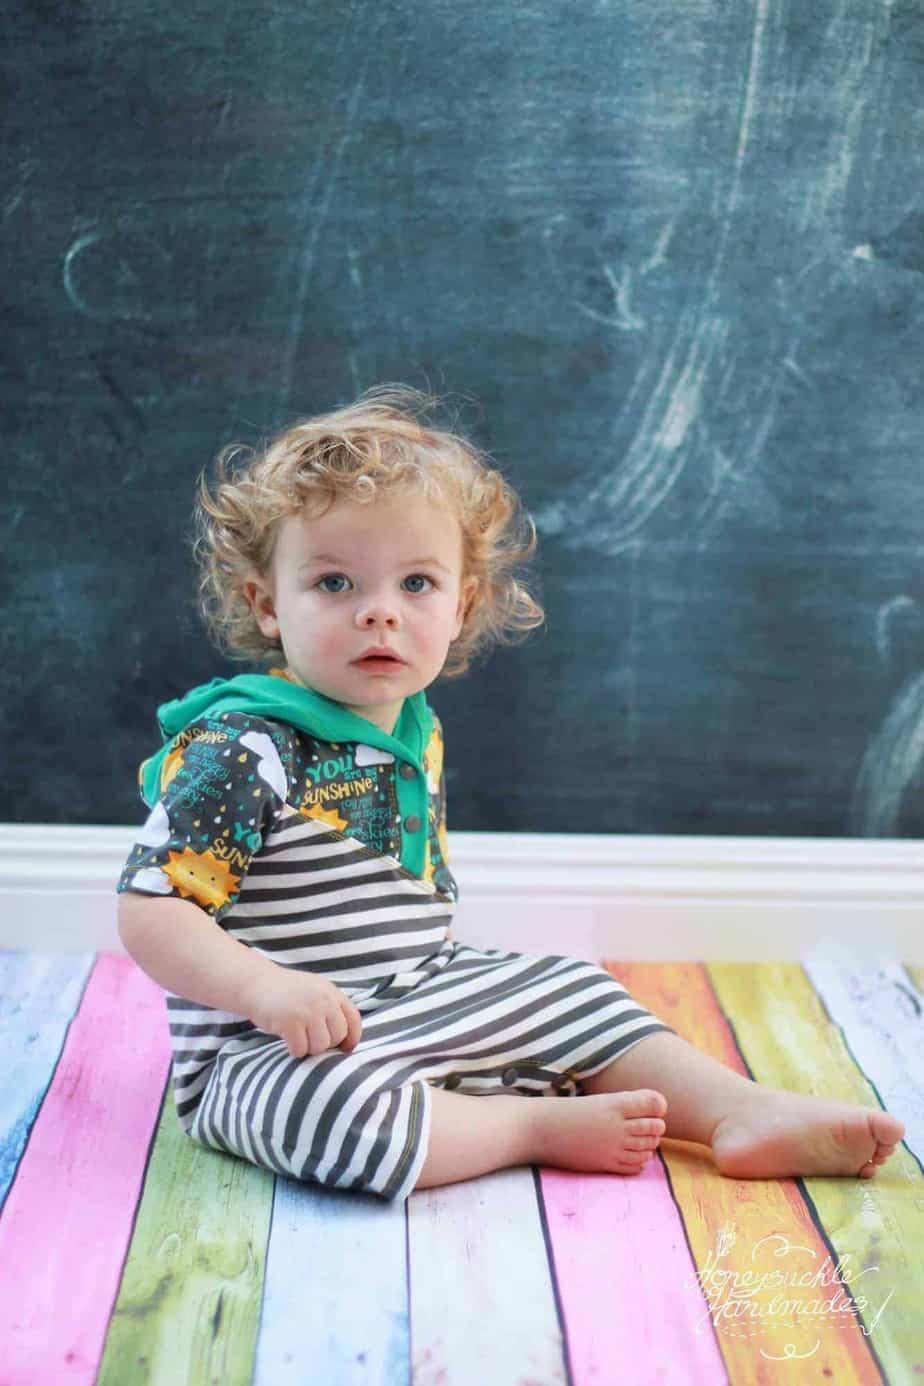 Milo Baby romper sewing pattern